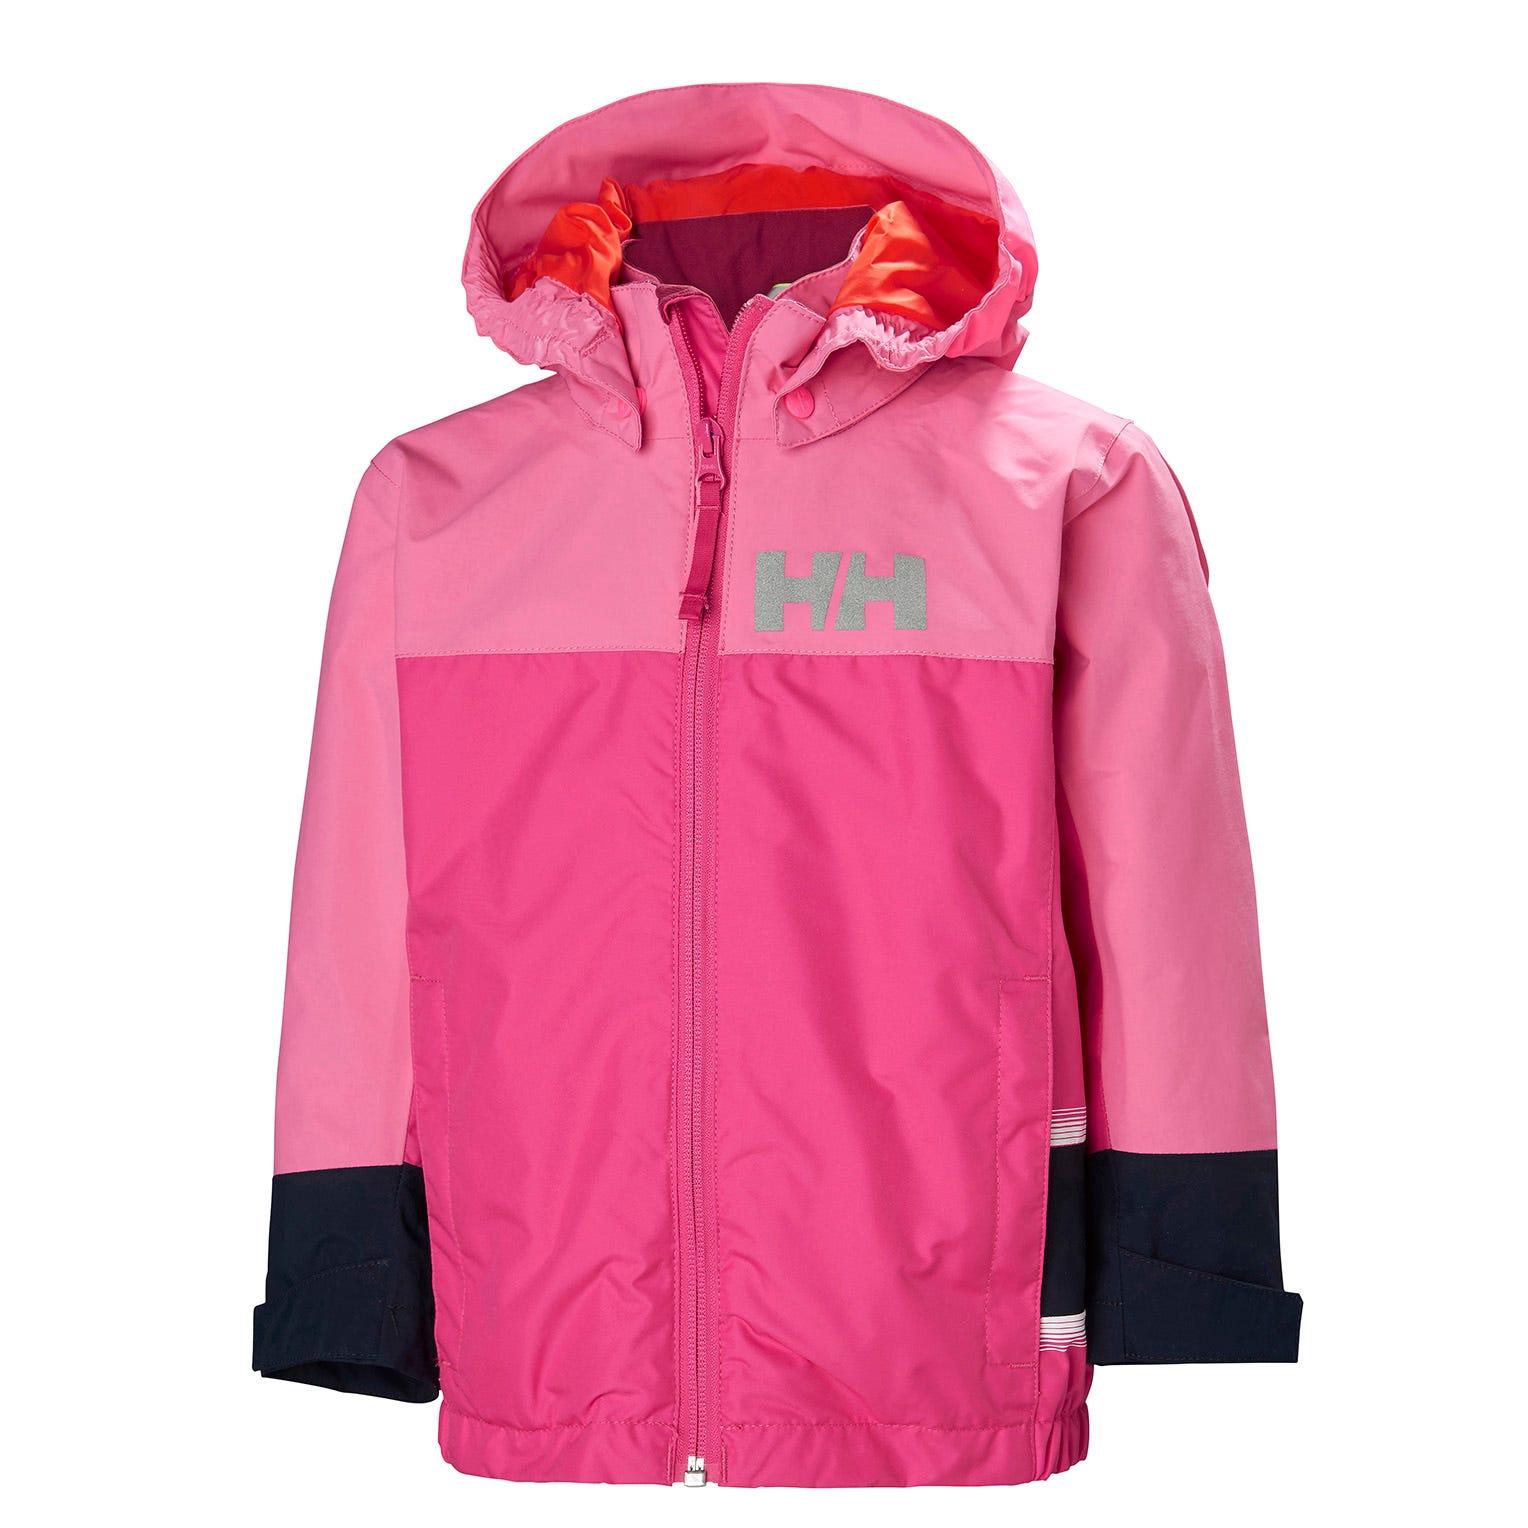 Helly Hansen Kids Norse Jacket Parka Pink 134/9